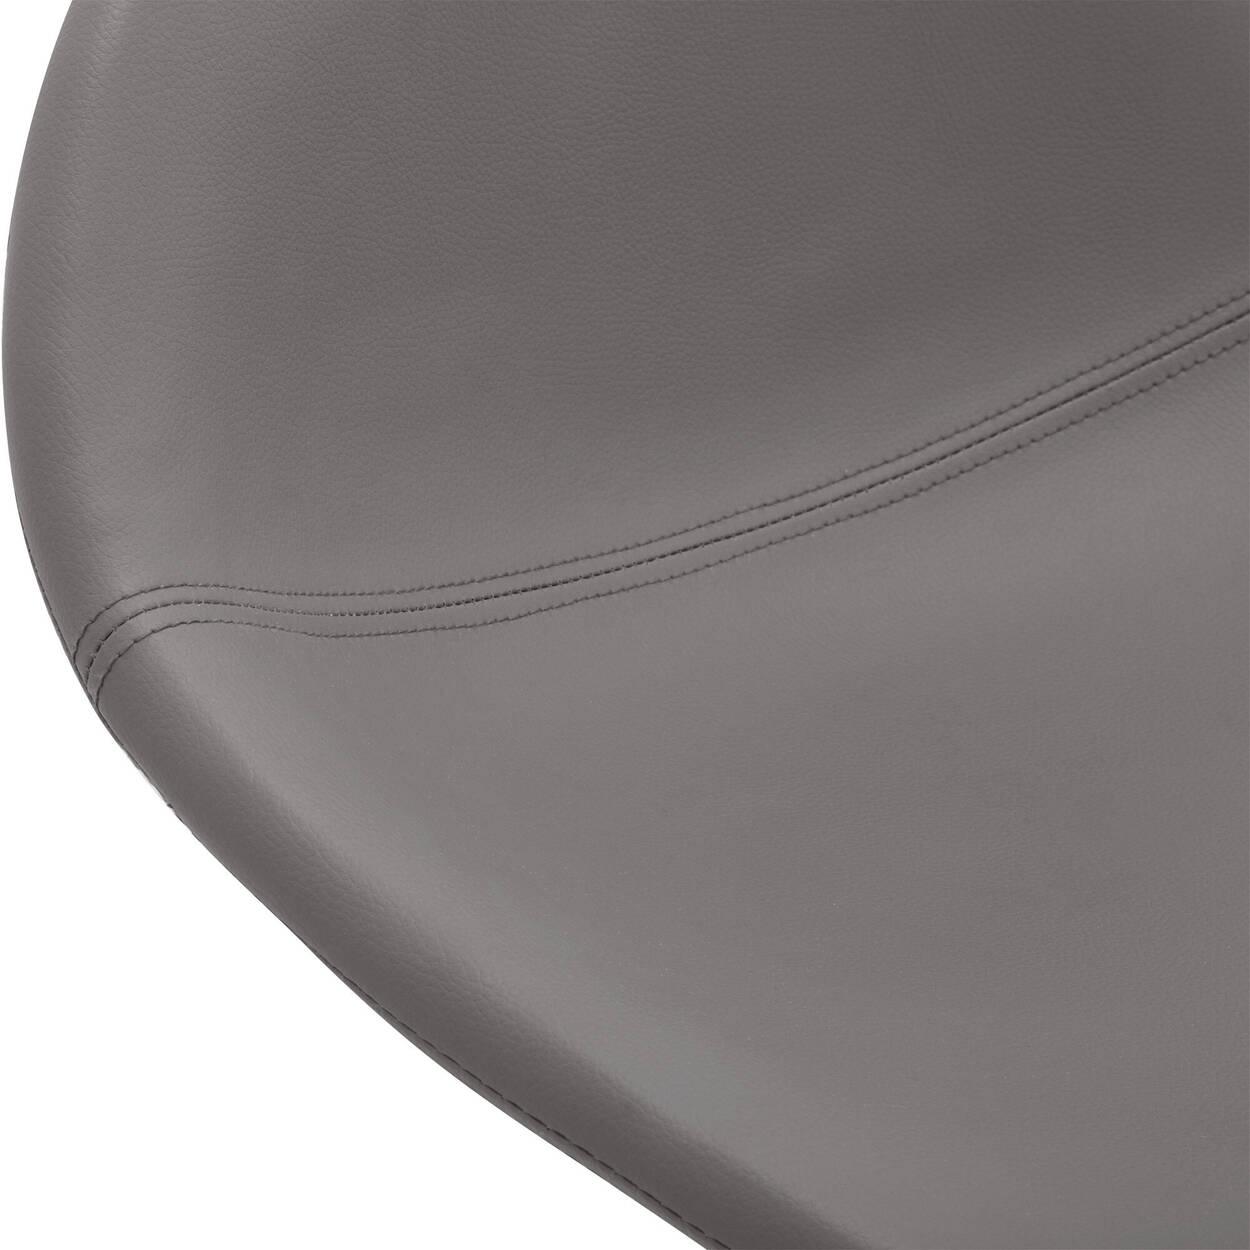 Faux Leather & Metal Adjustable Bar Stool